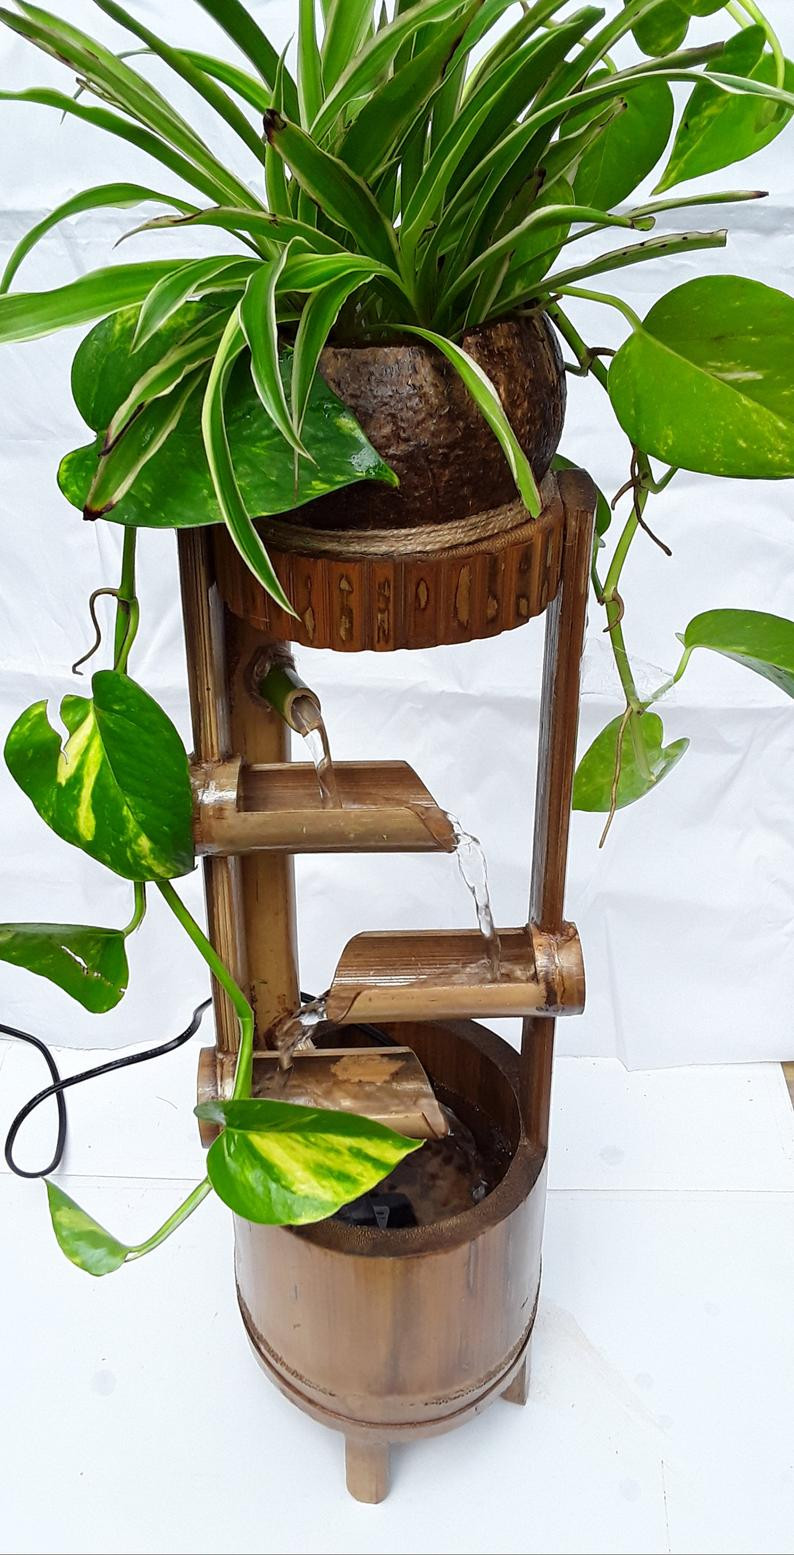 Indoor fountain as a Biophilic decorative piece.